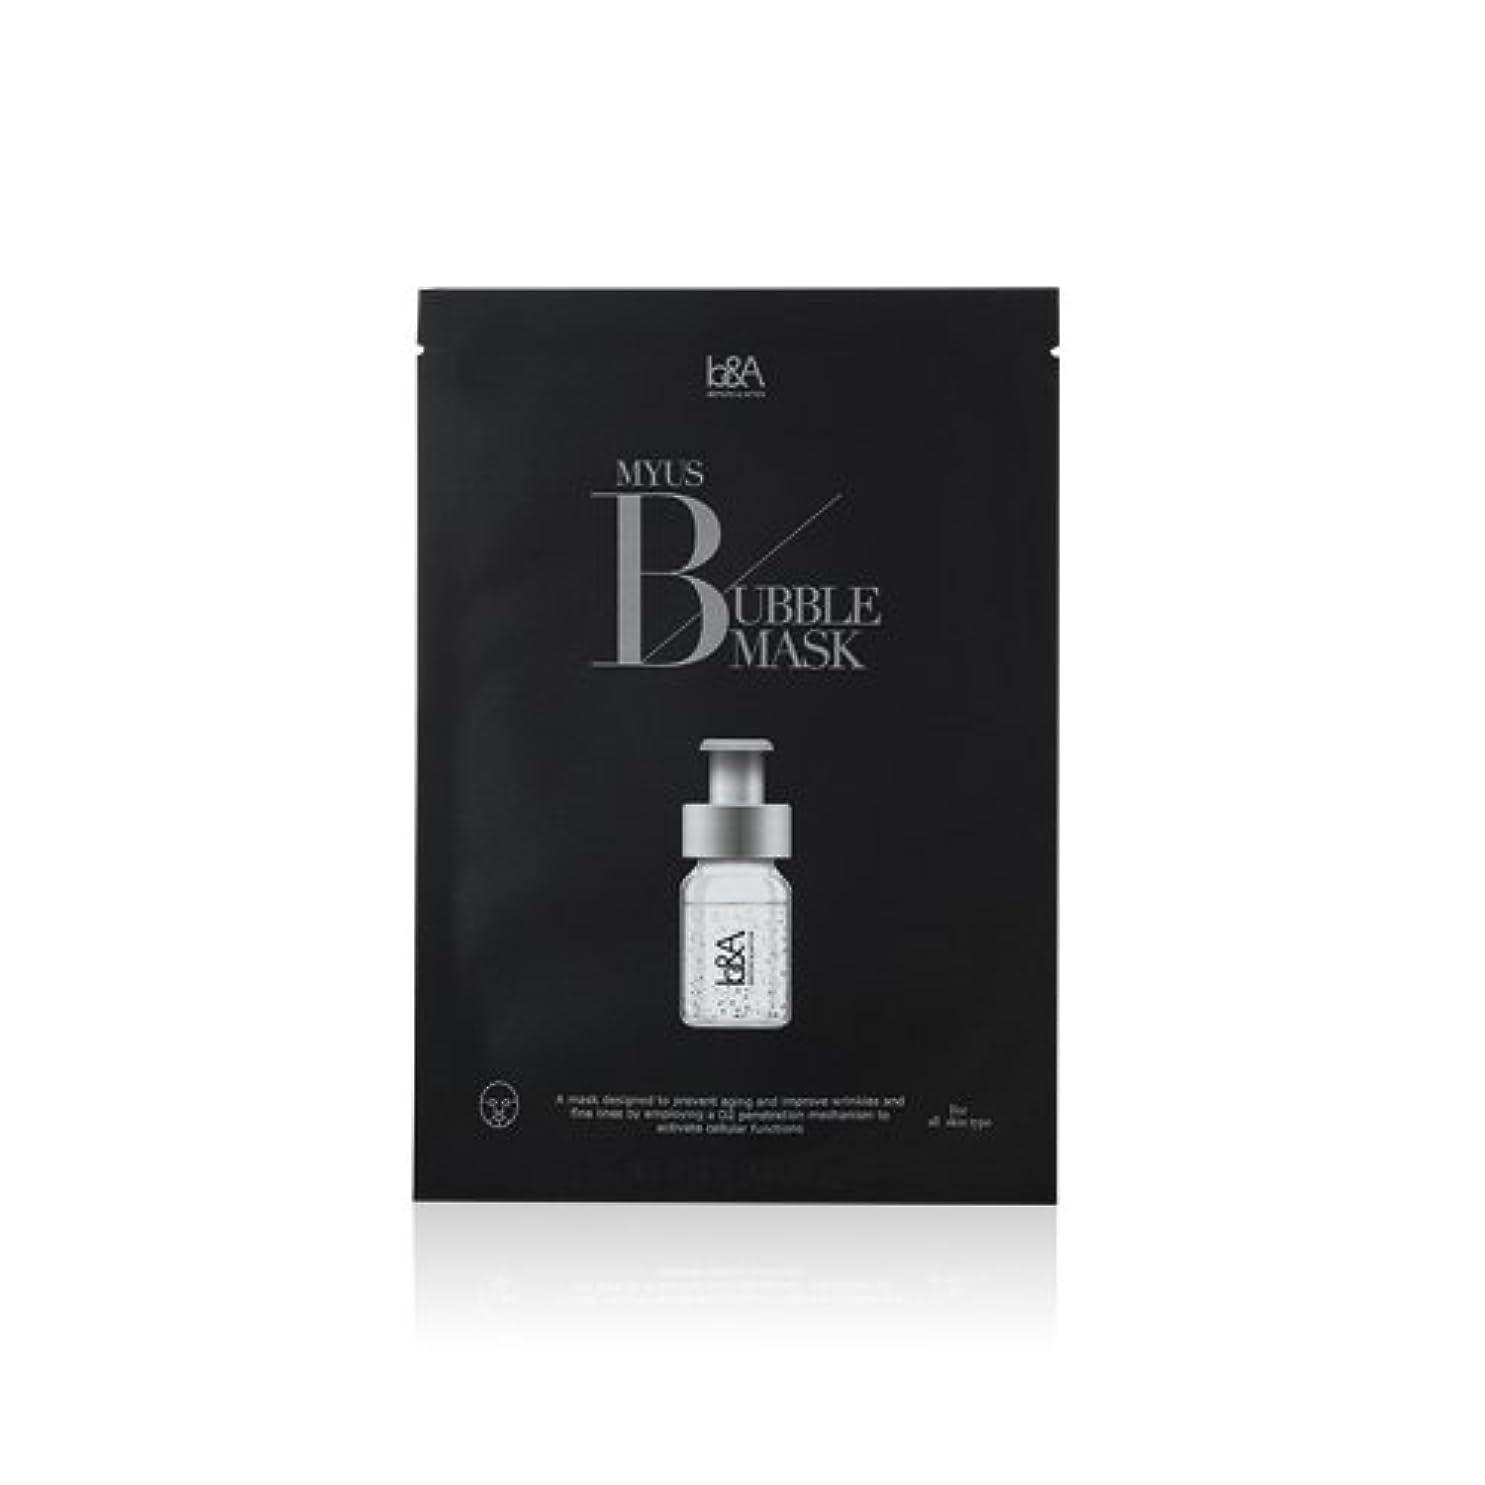 装備する市民権副BigBang Top [K cosmetic][K beauty] Celeb's-Secret MYUS BUBBLE MASK 5pcs [海外直送品][並行輸入品]